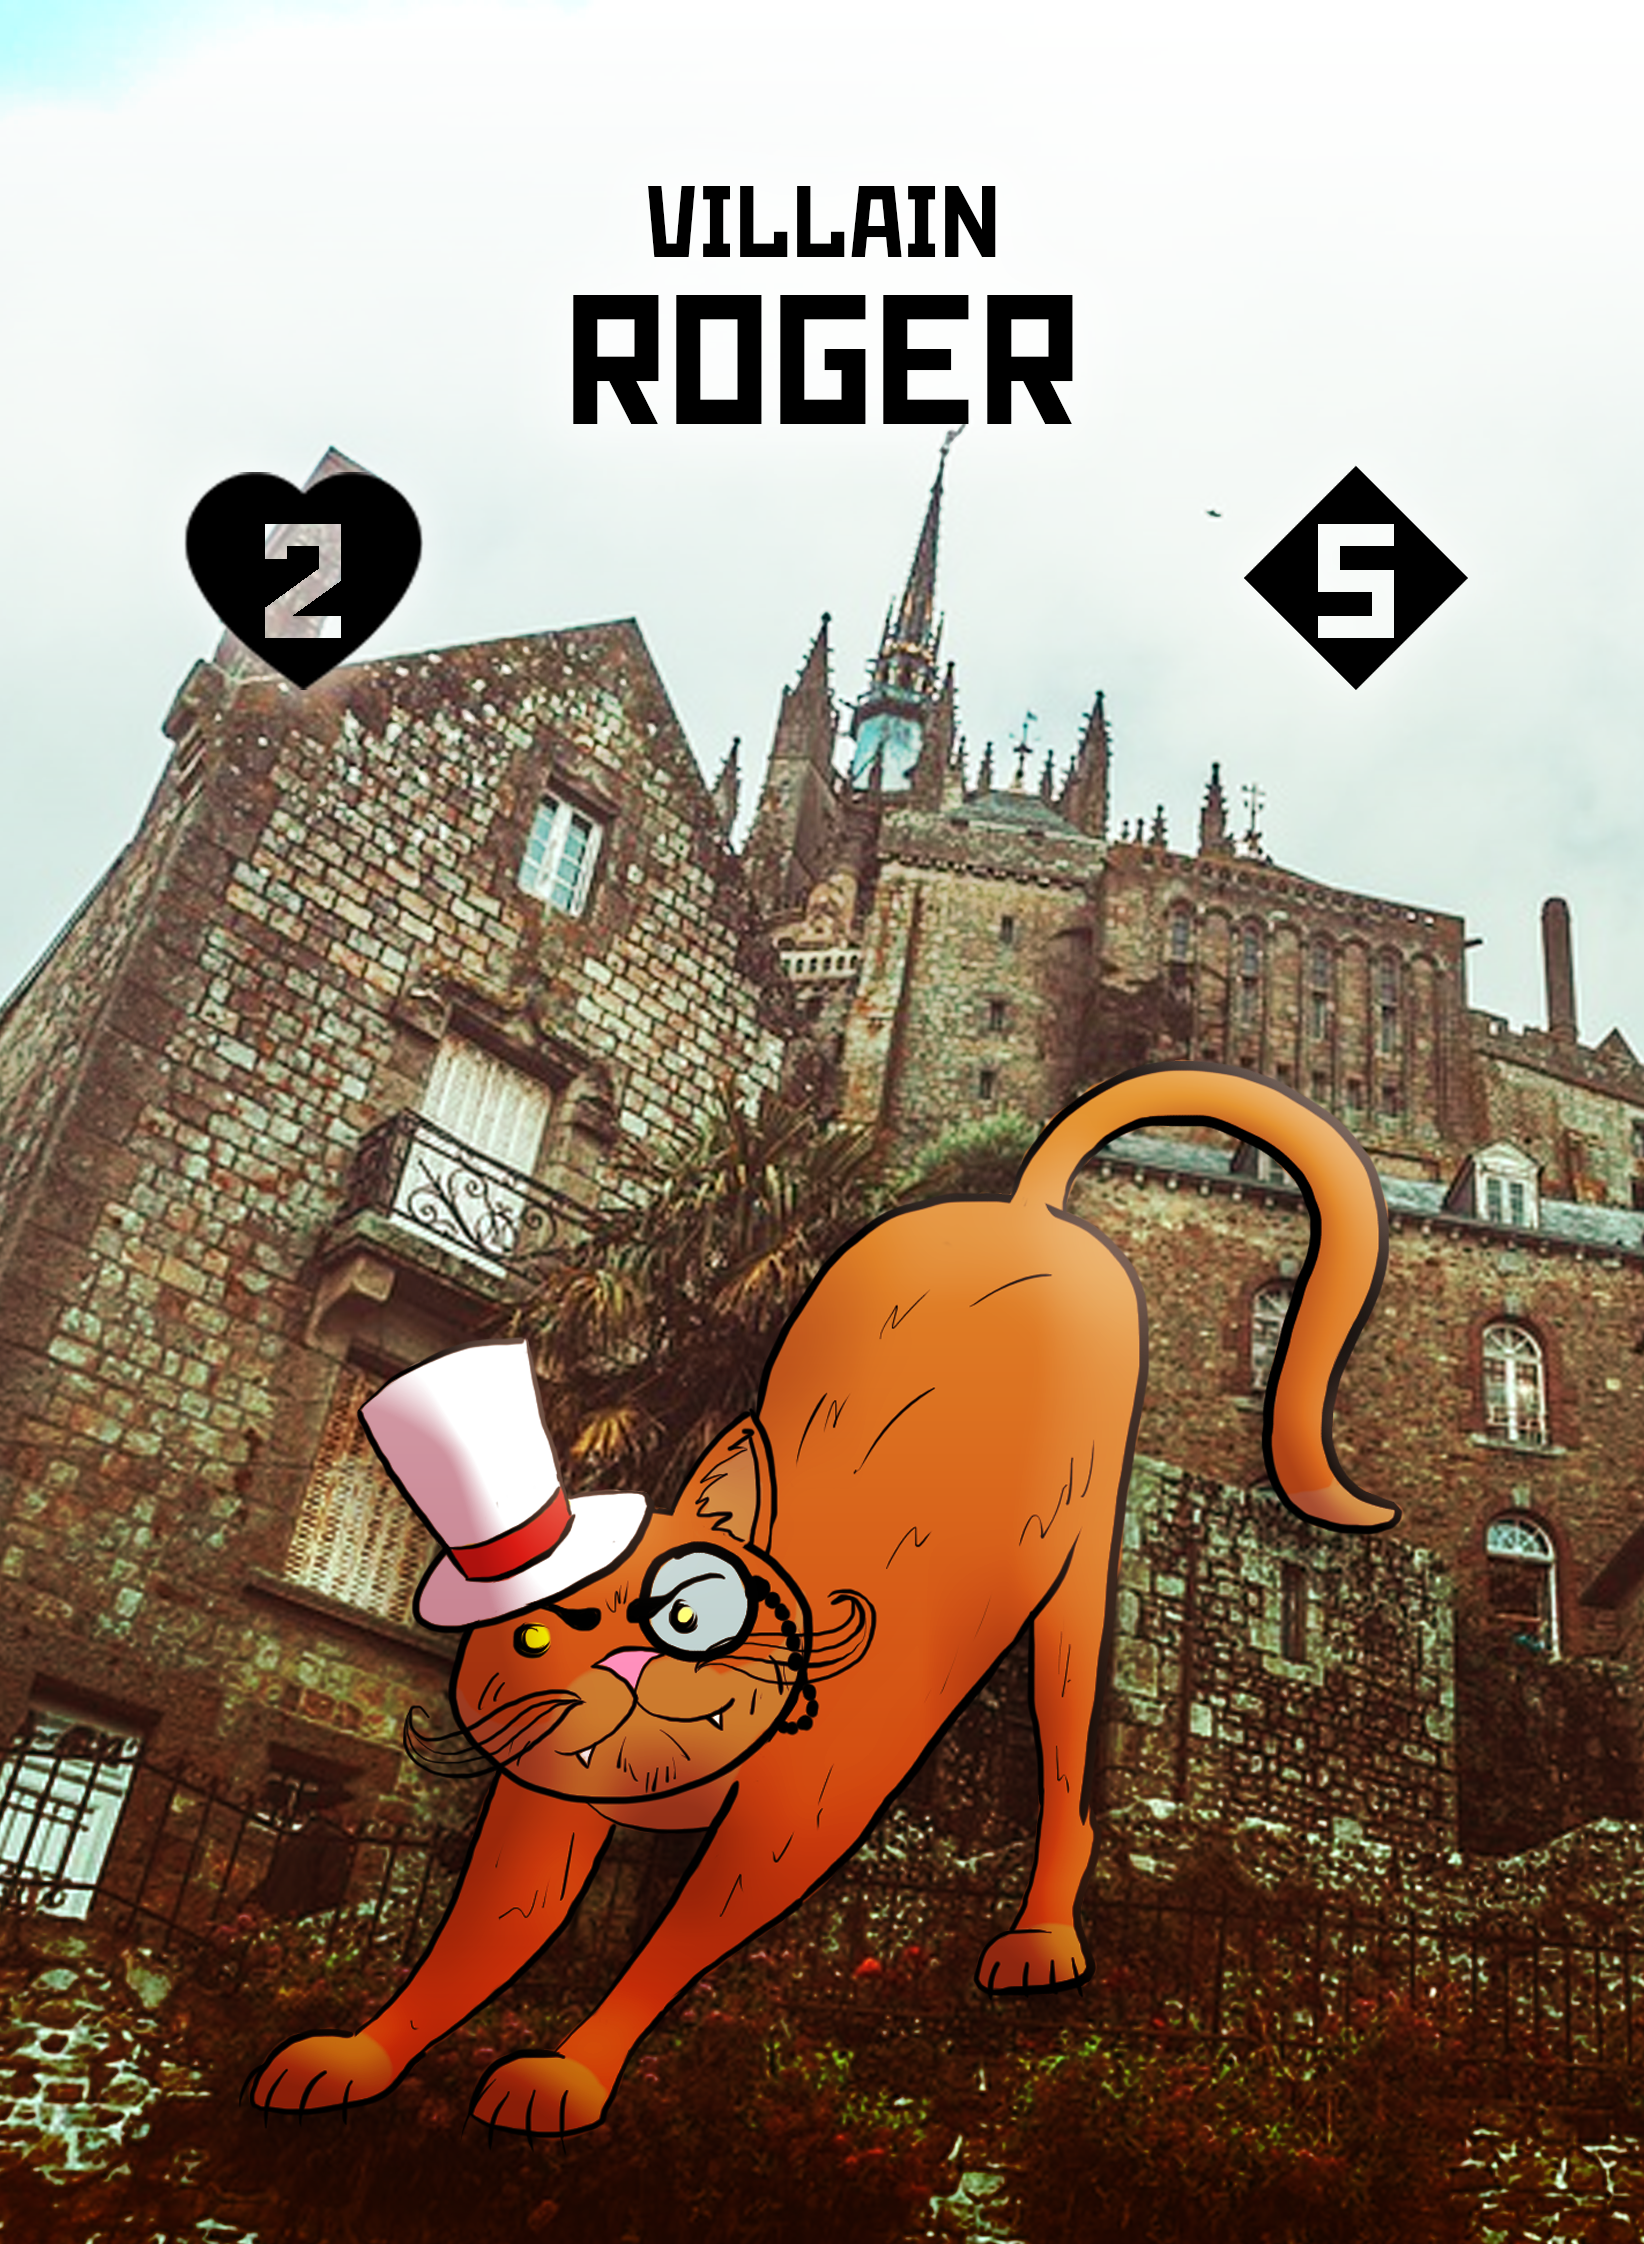 dastardly-villain-roger.png